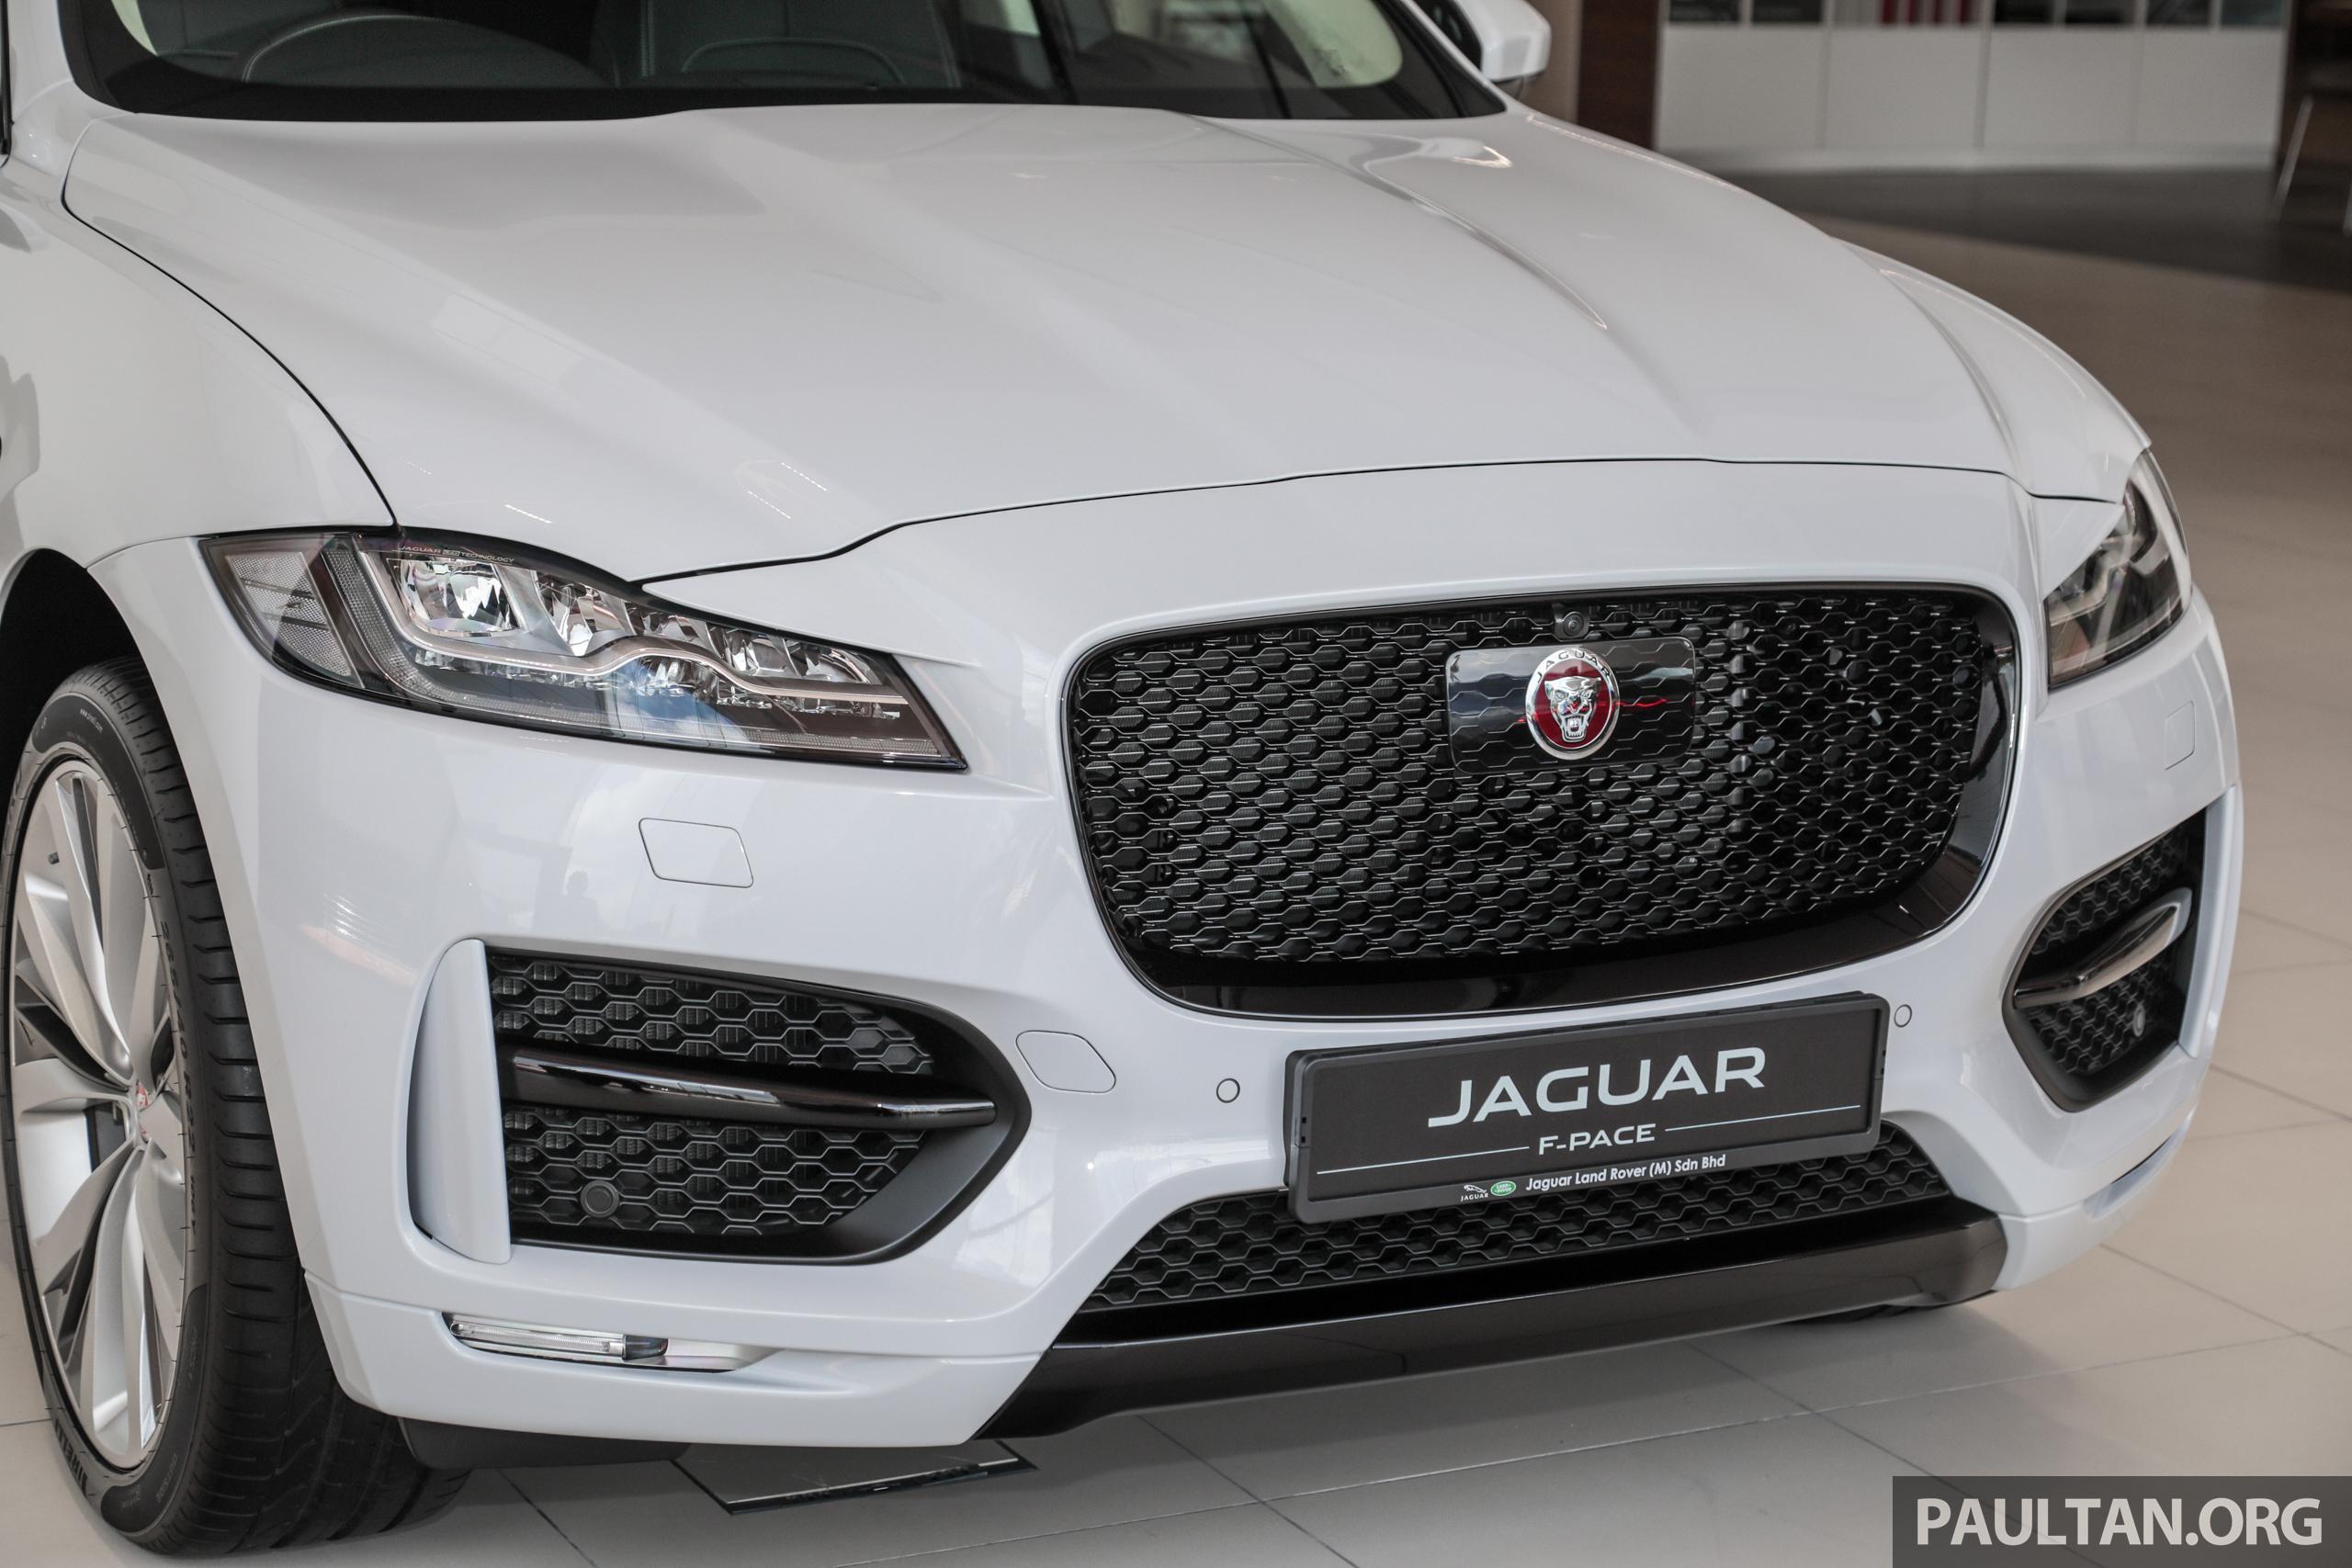 2020 Jaguar F Pace 2 0p Awd 5dr R Sport Malaysia Ext 6 Paul Tan S Automotive News